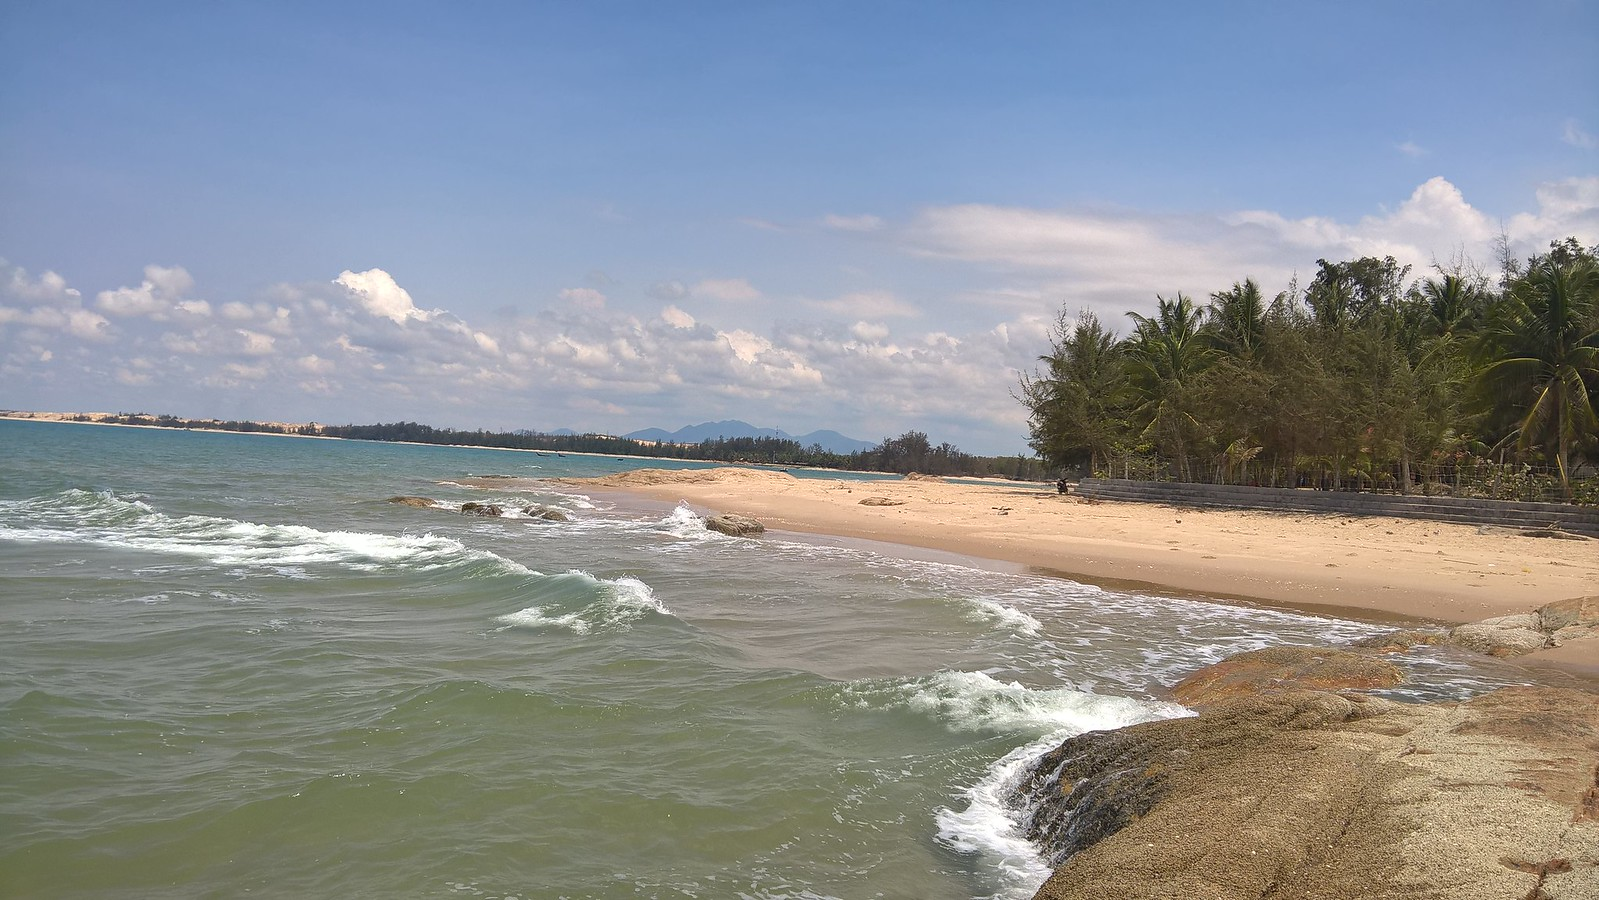 Beach in La Gi Vietnam.